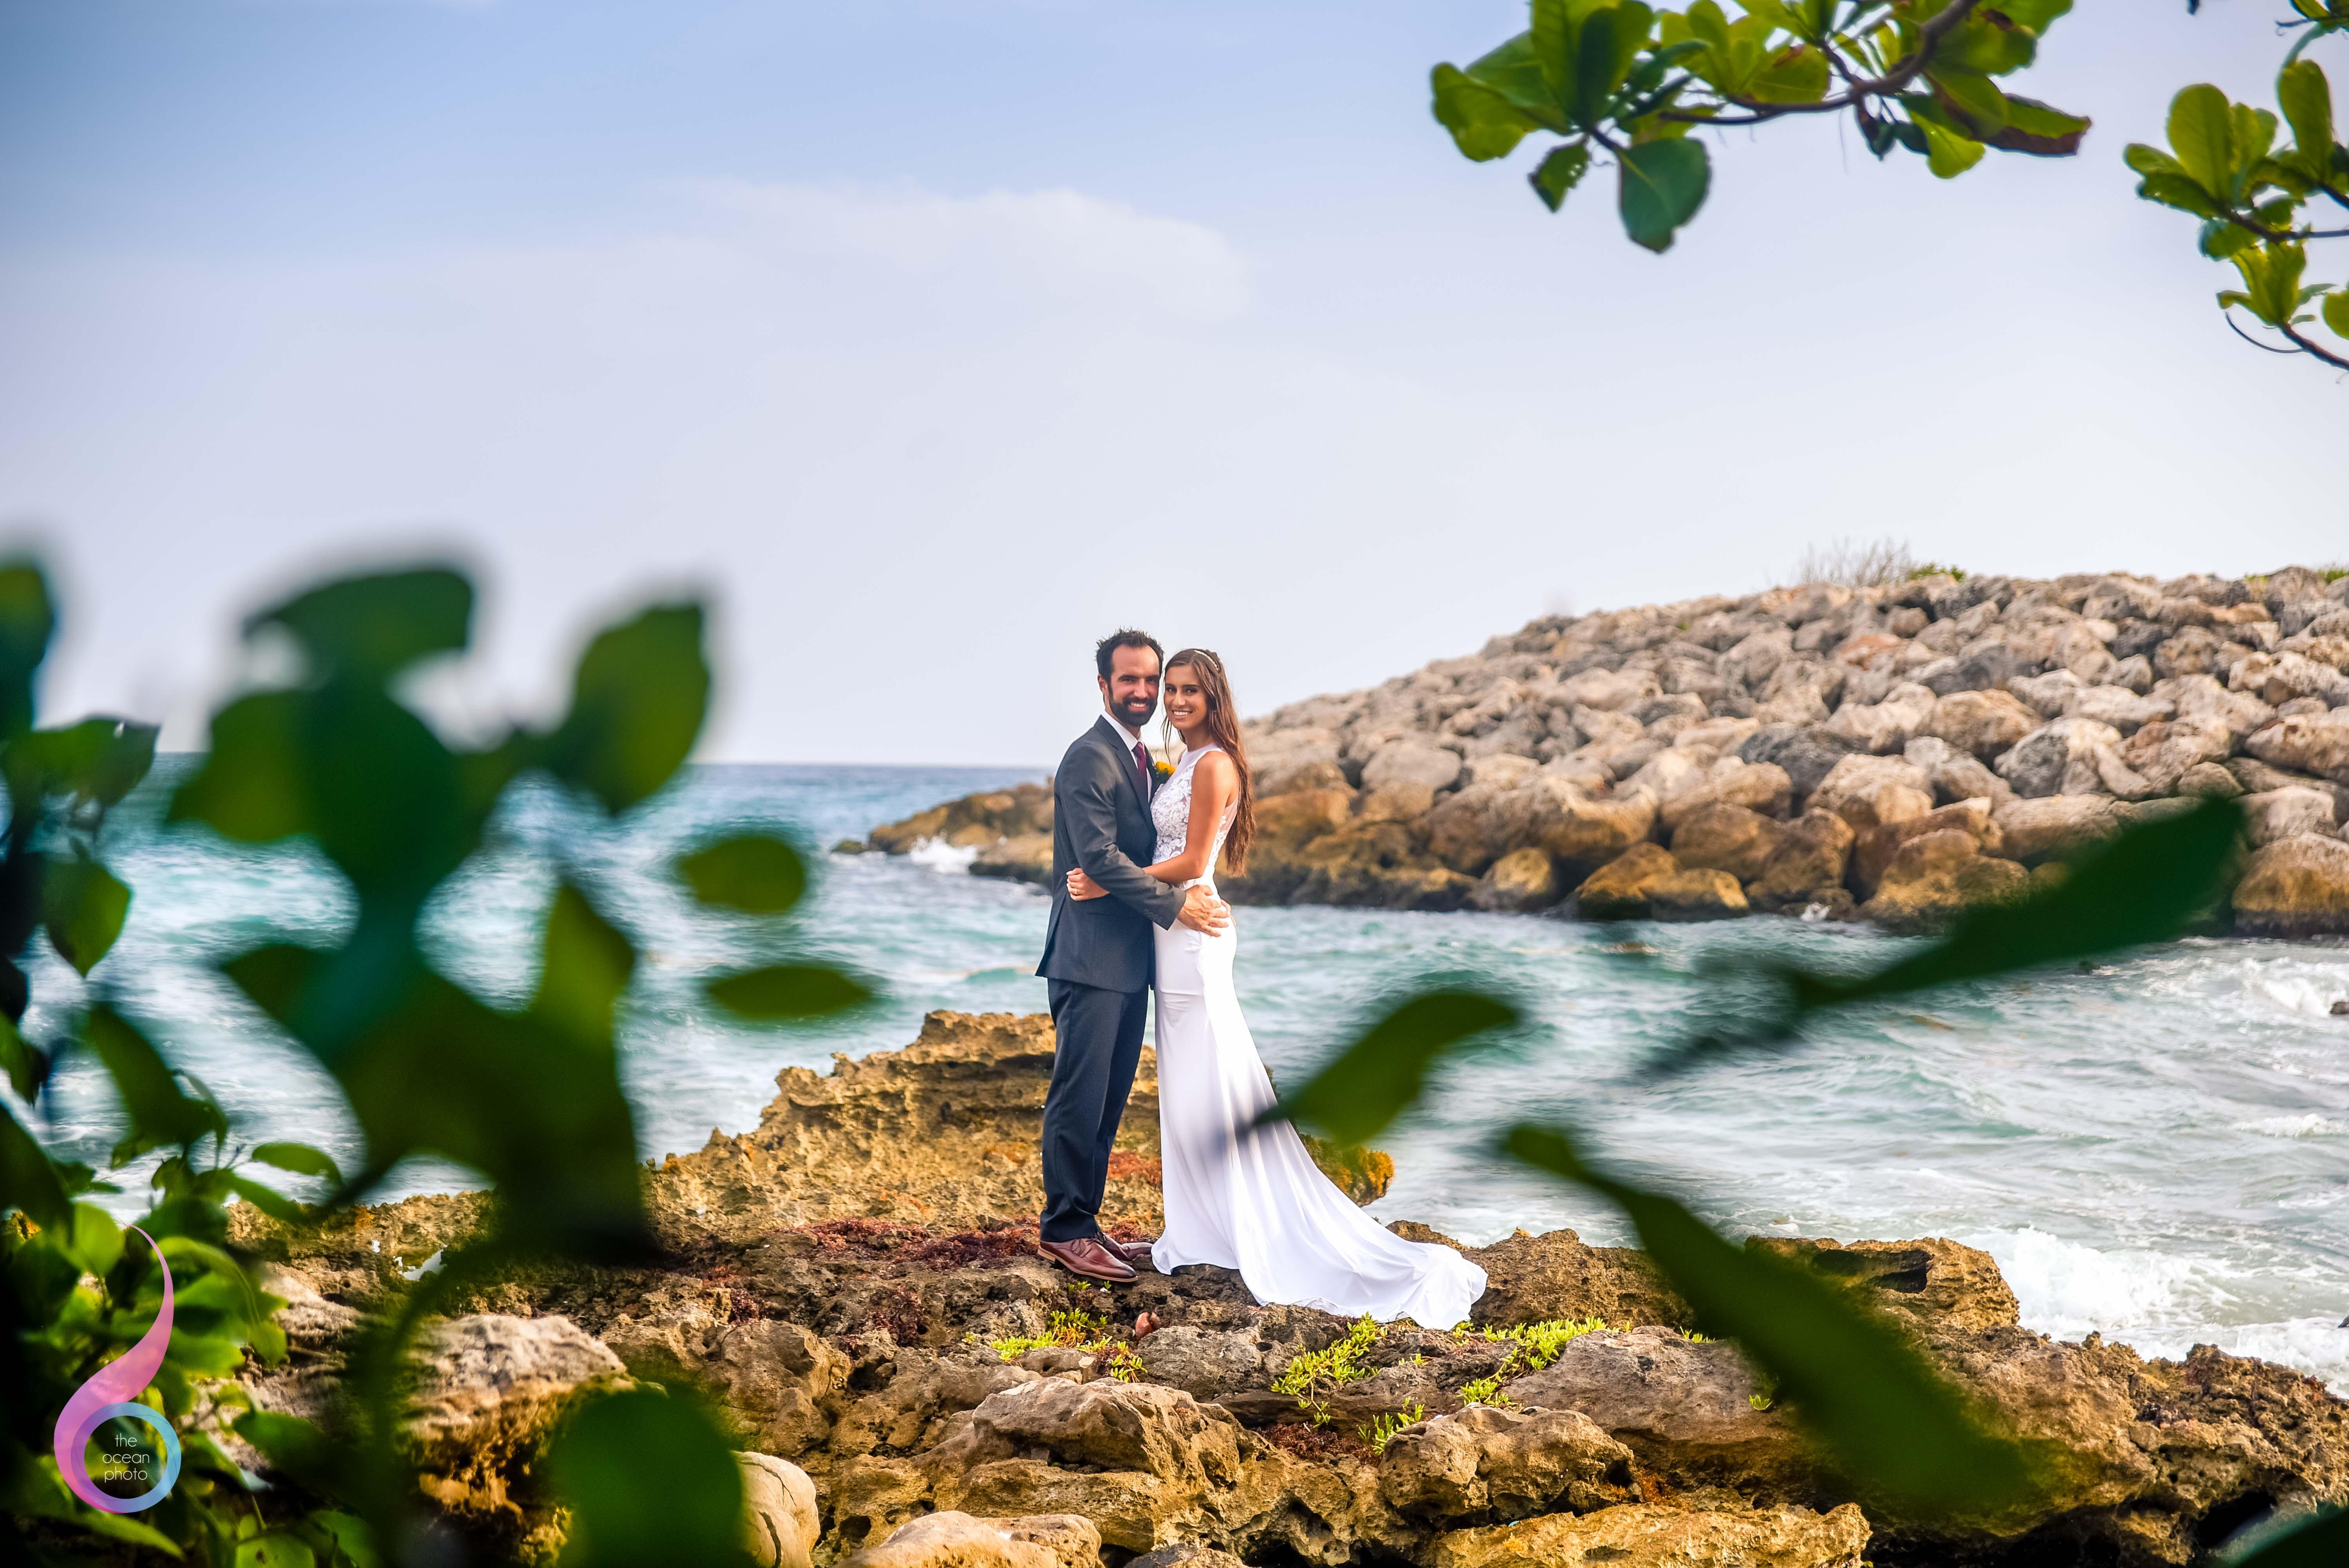 theoceanphotowedding-61